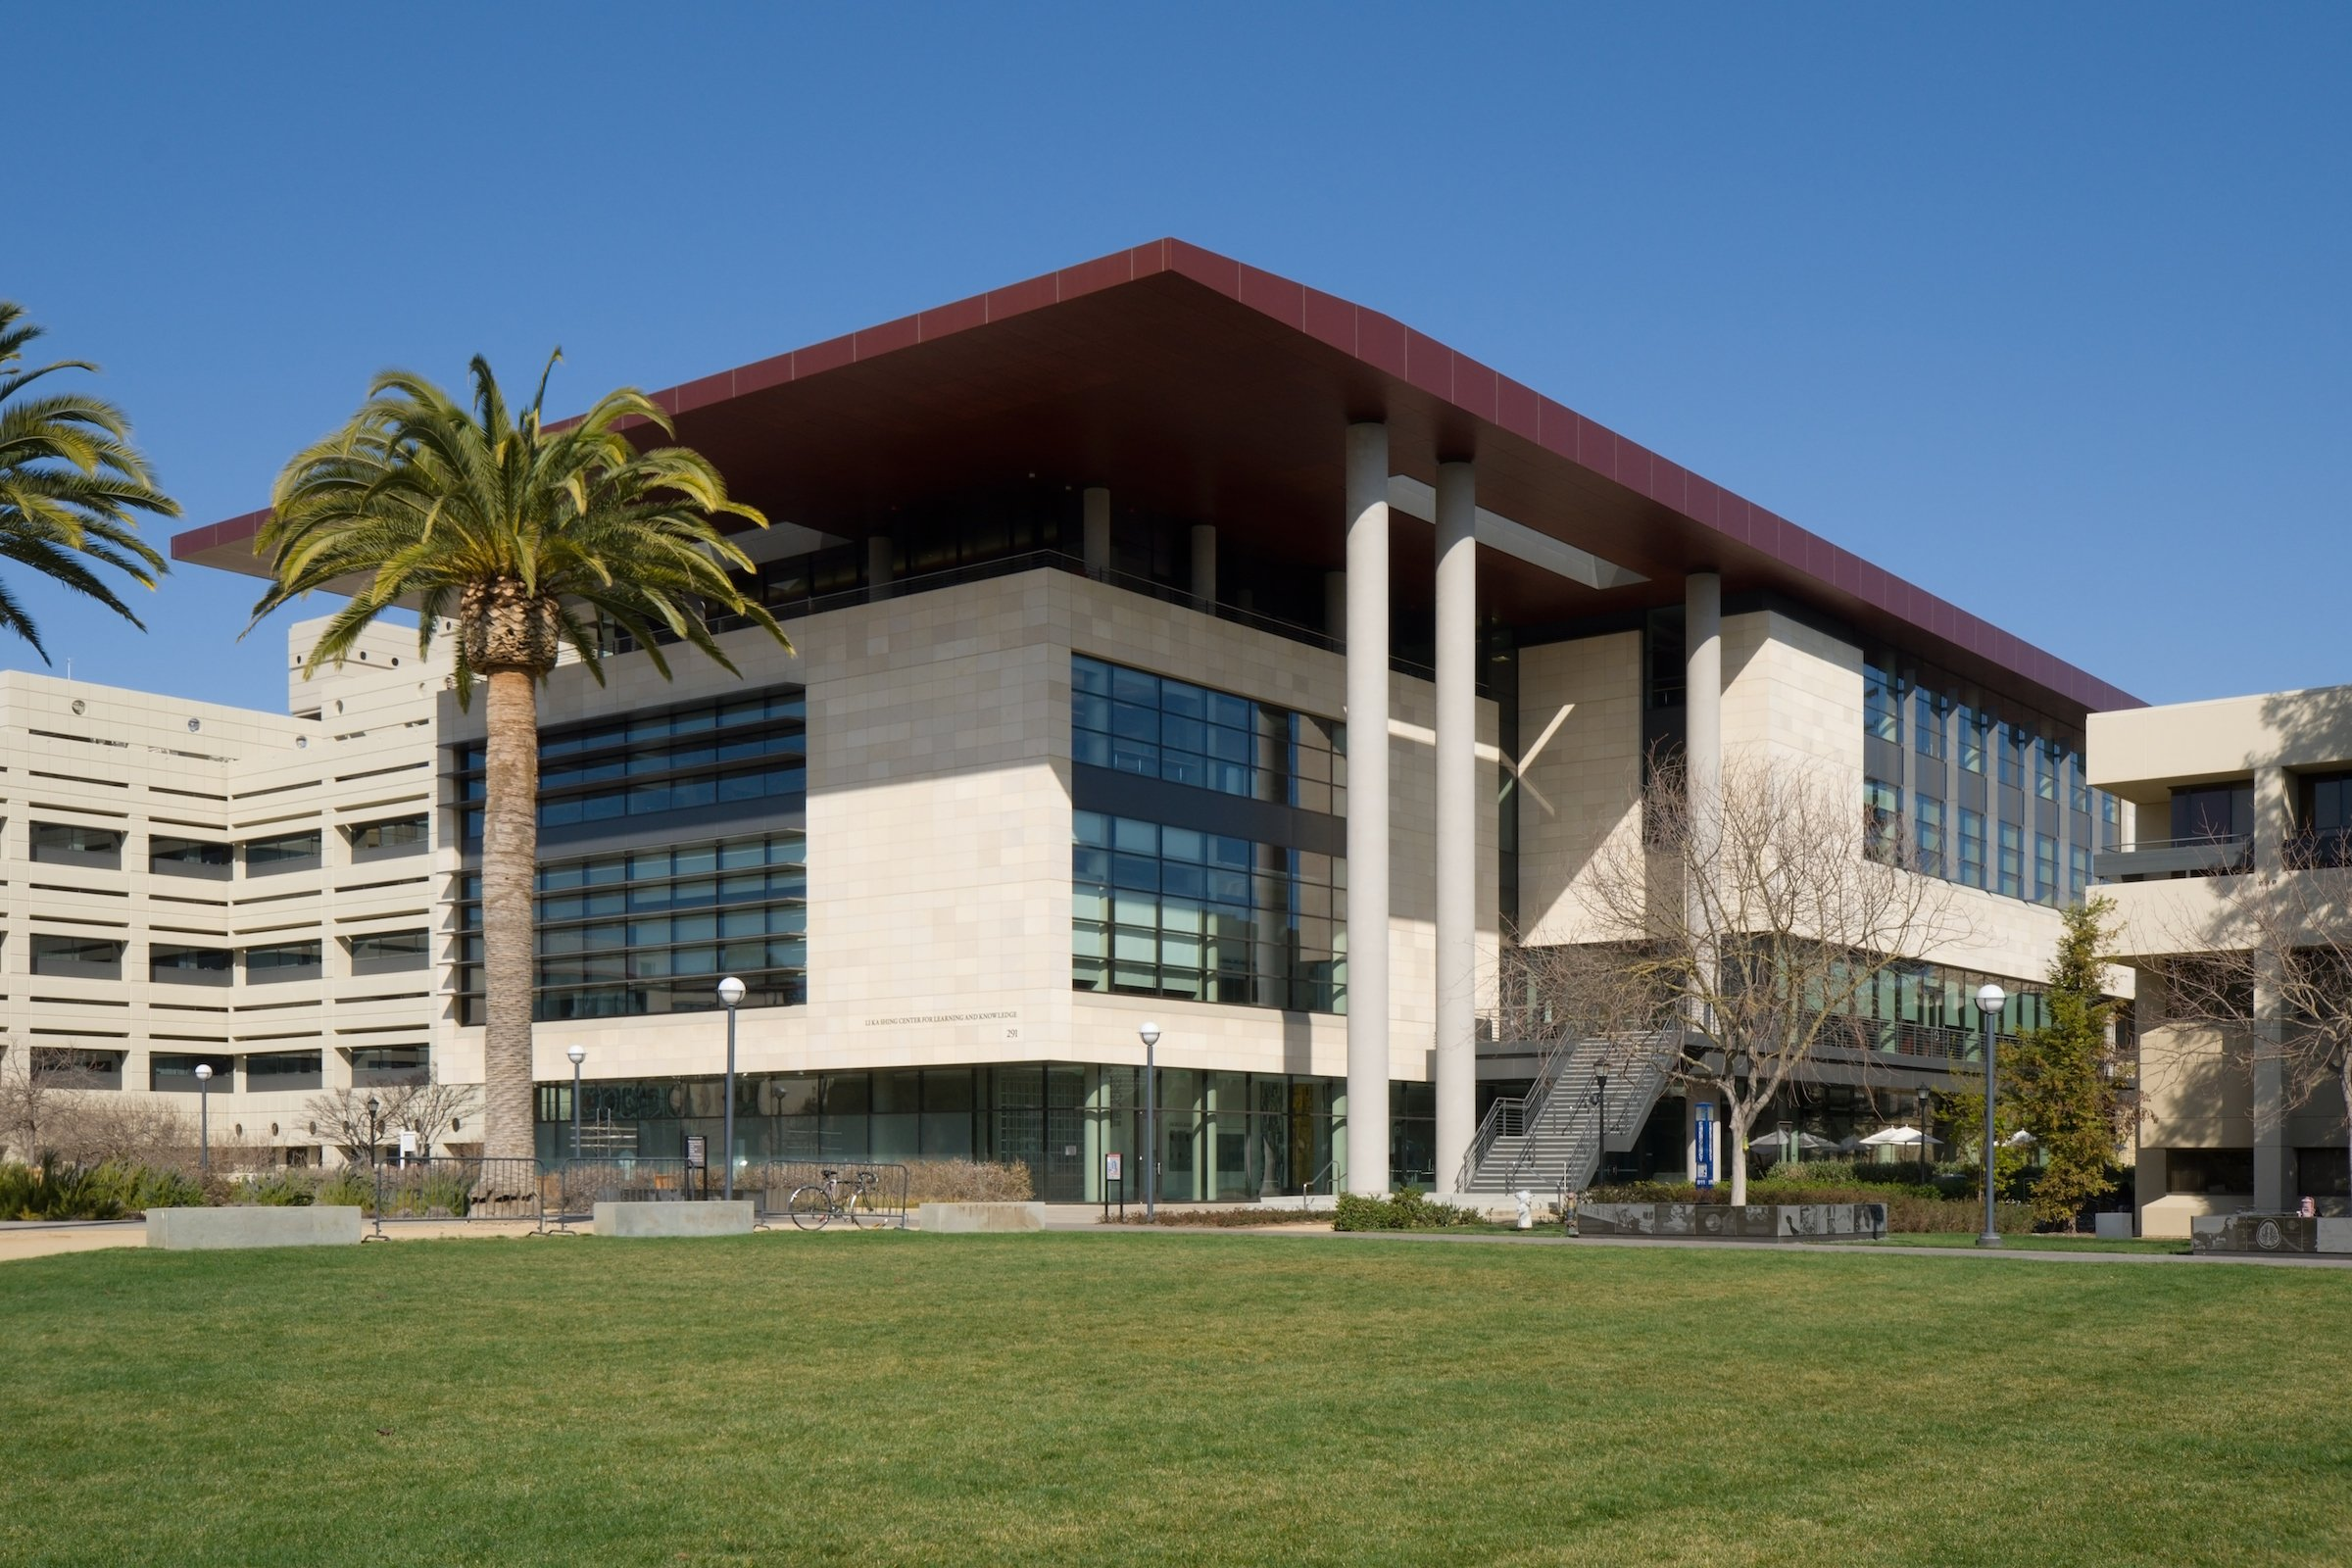 Stanford University Medical Center >> Stanford Medicine Professor Fired For Violating University